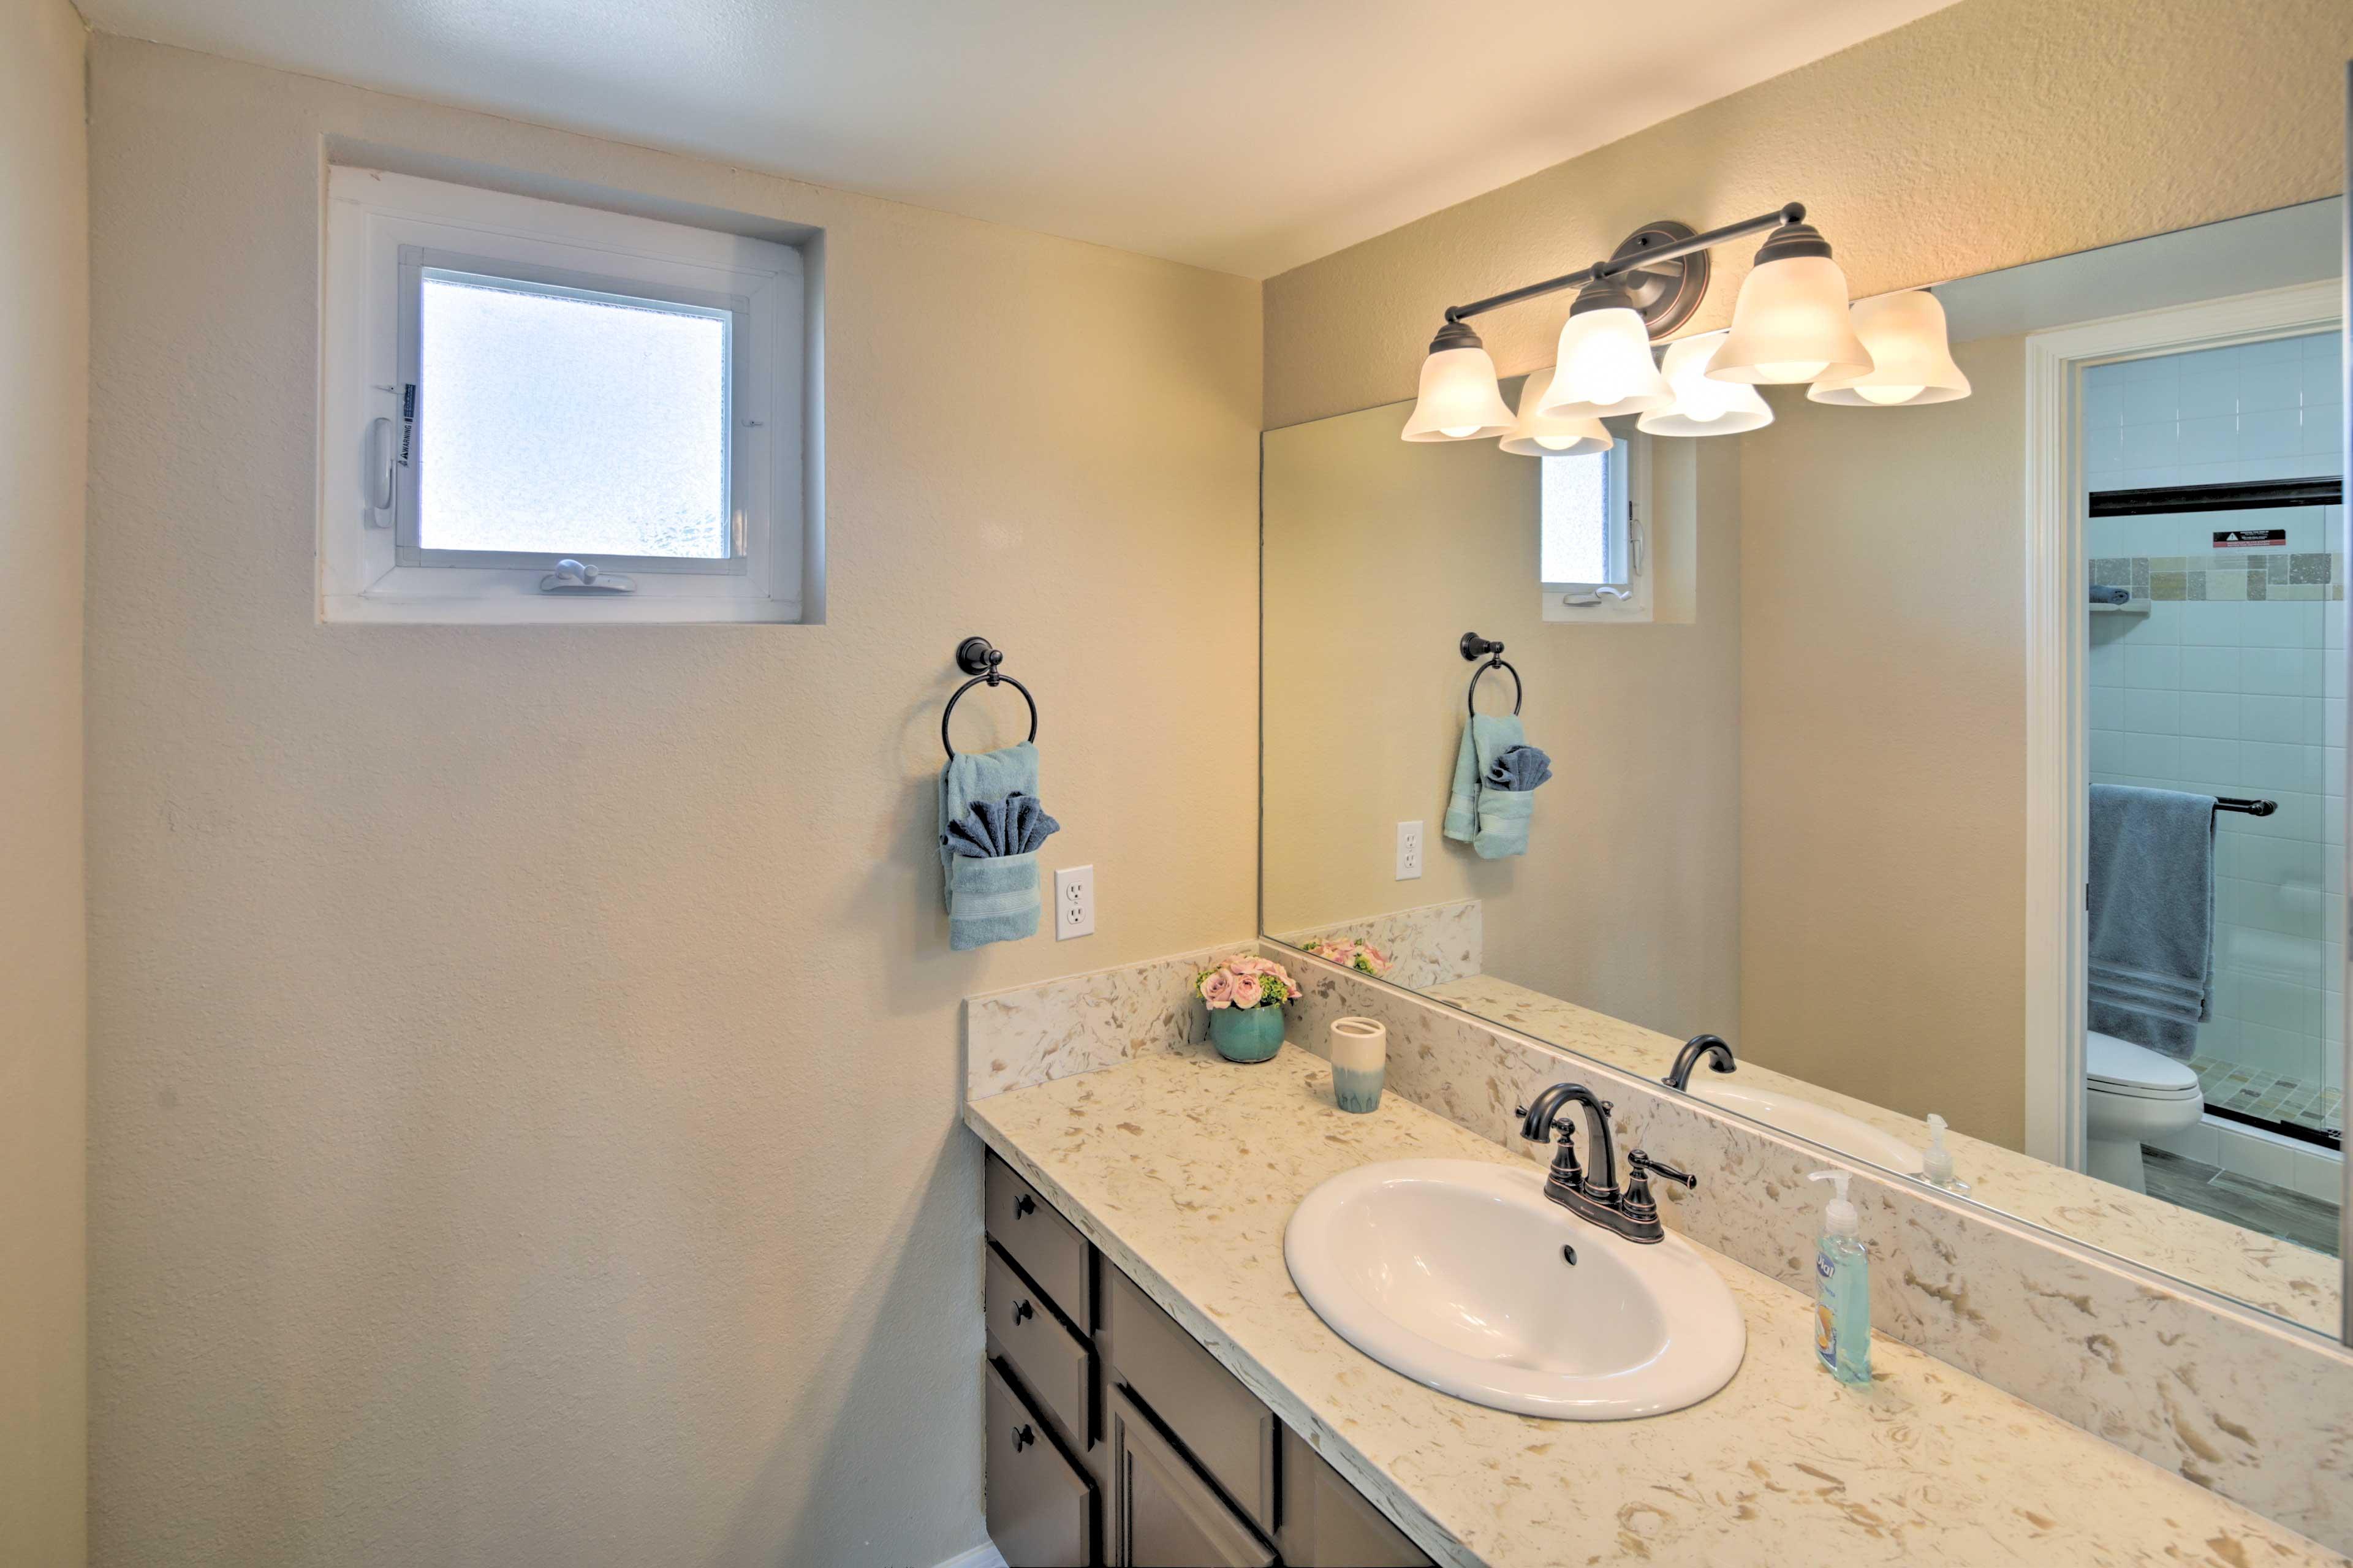 The en-suite bath features a walk-in glass-enclosed shower!